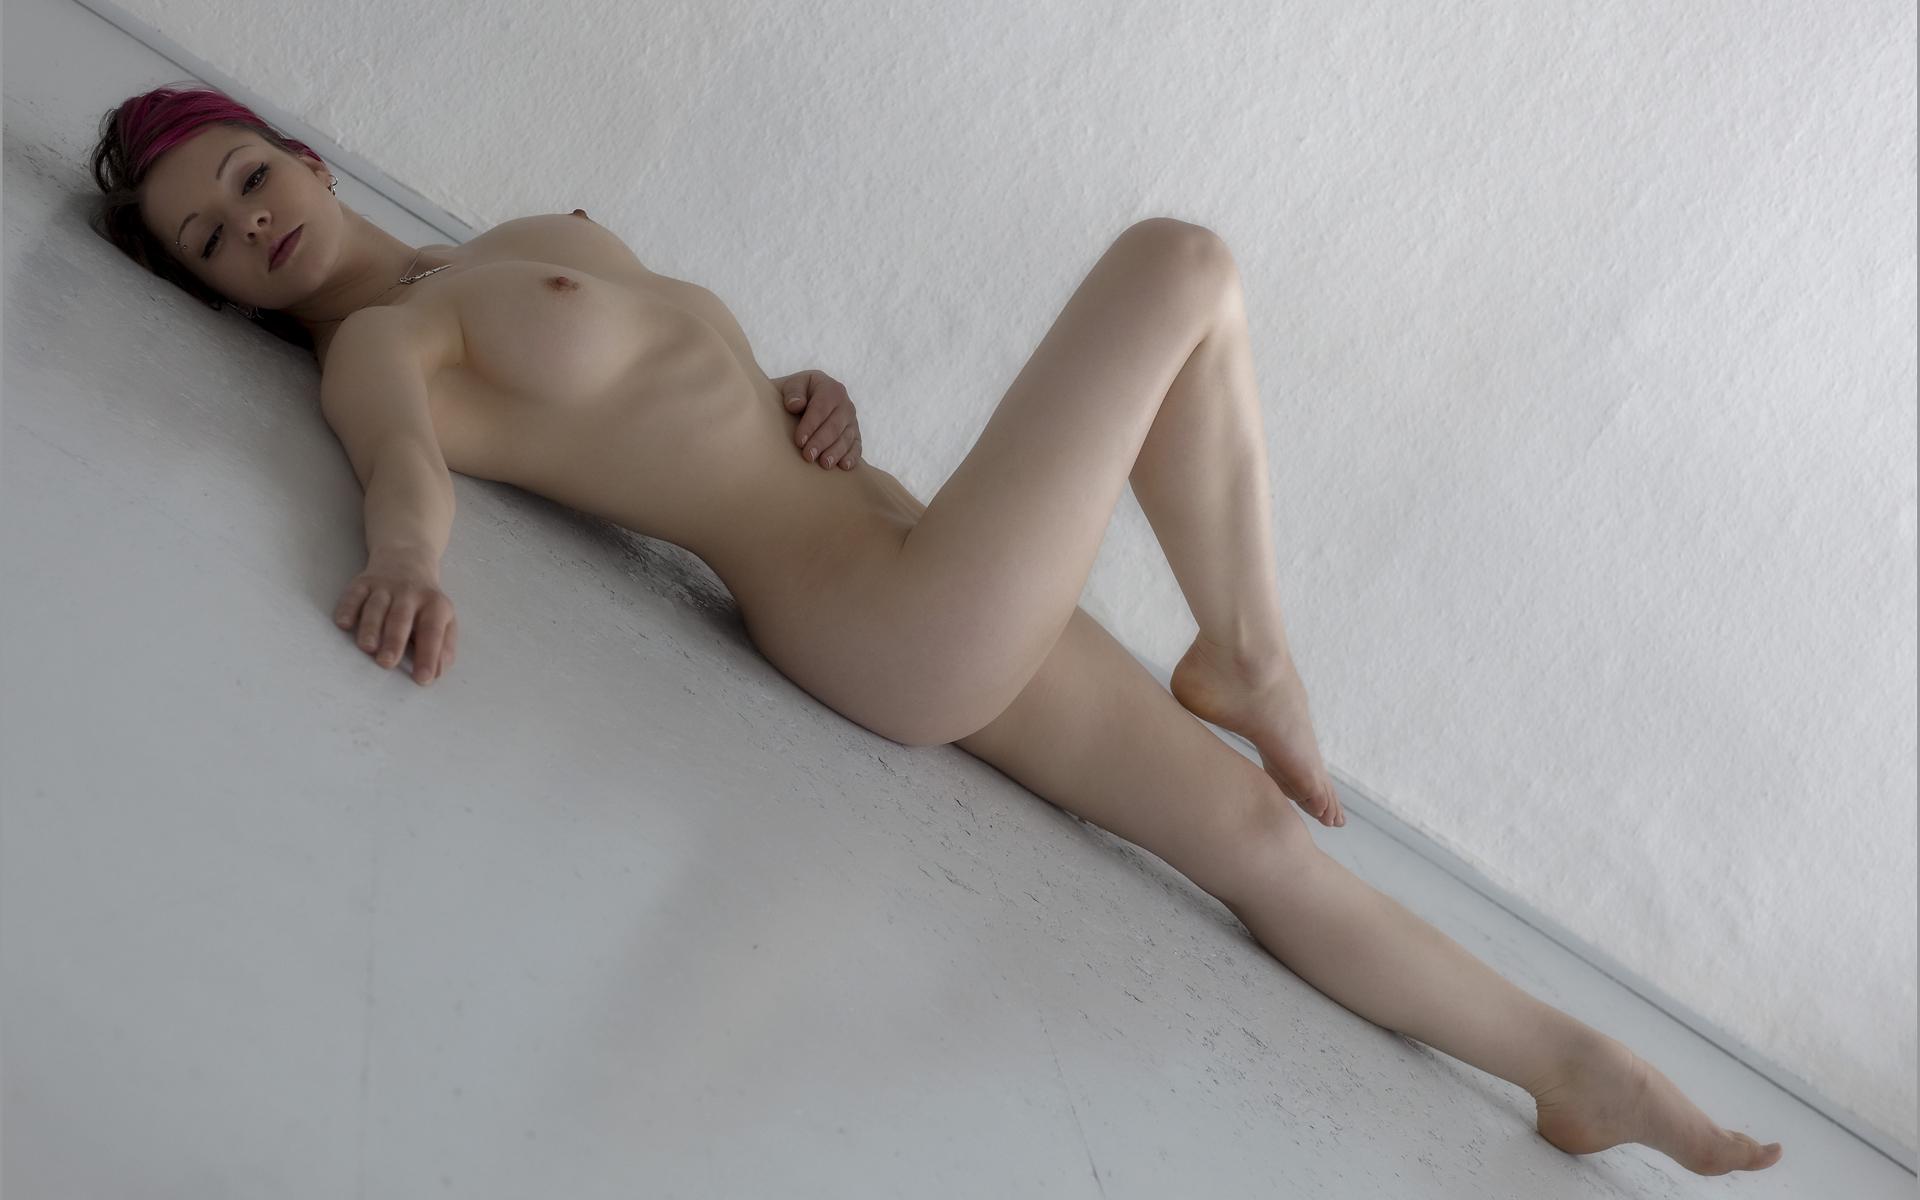 gambar wanita cantik seksi